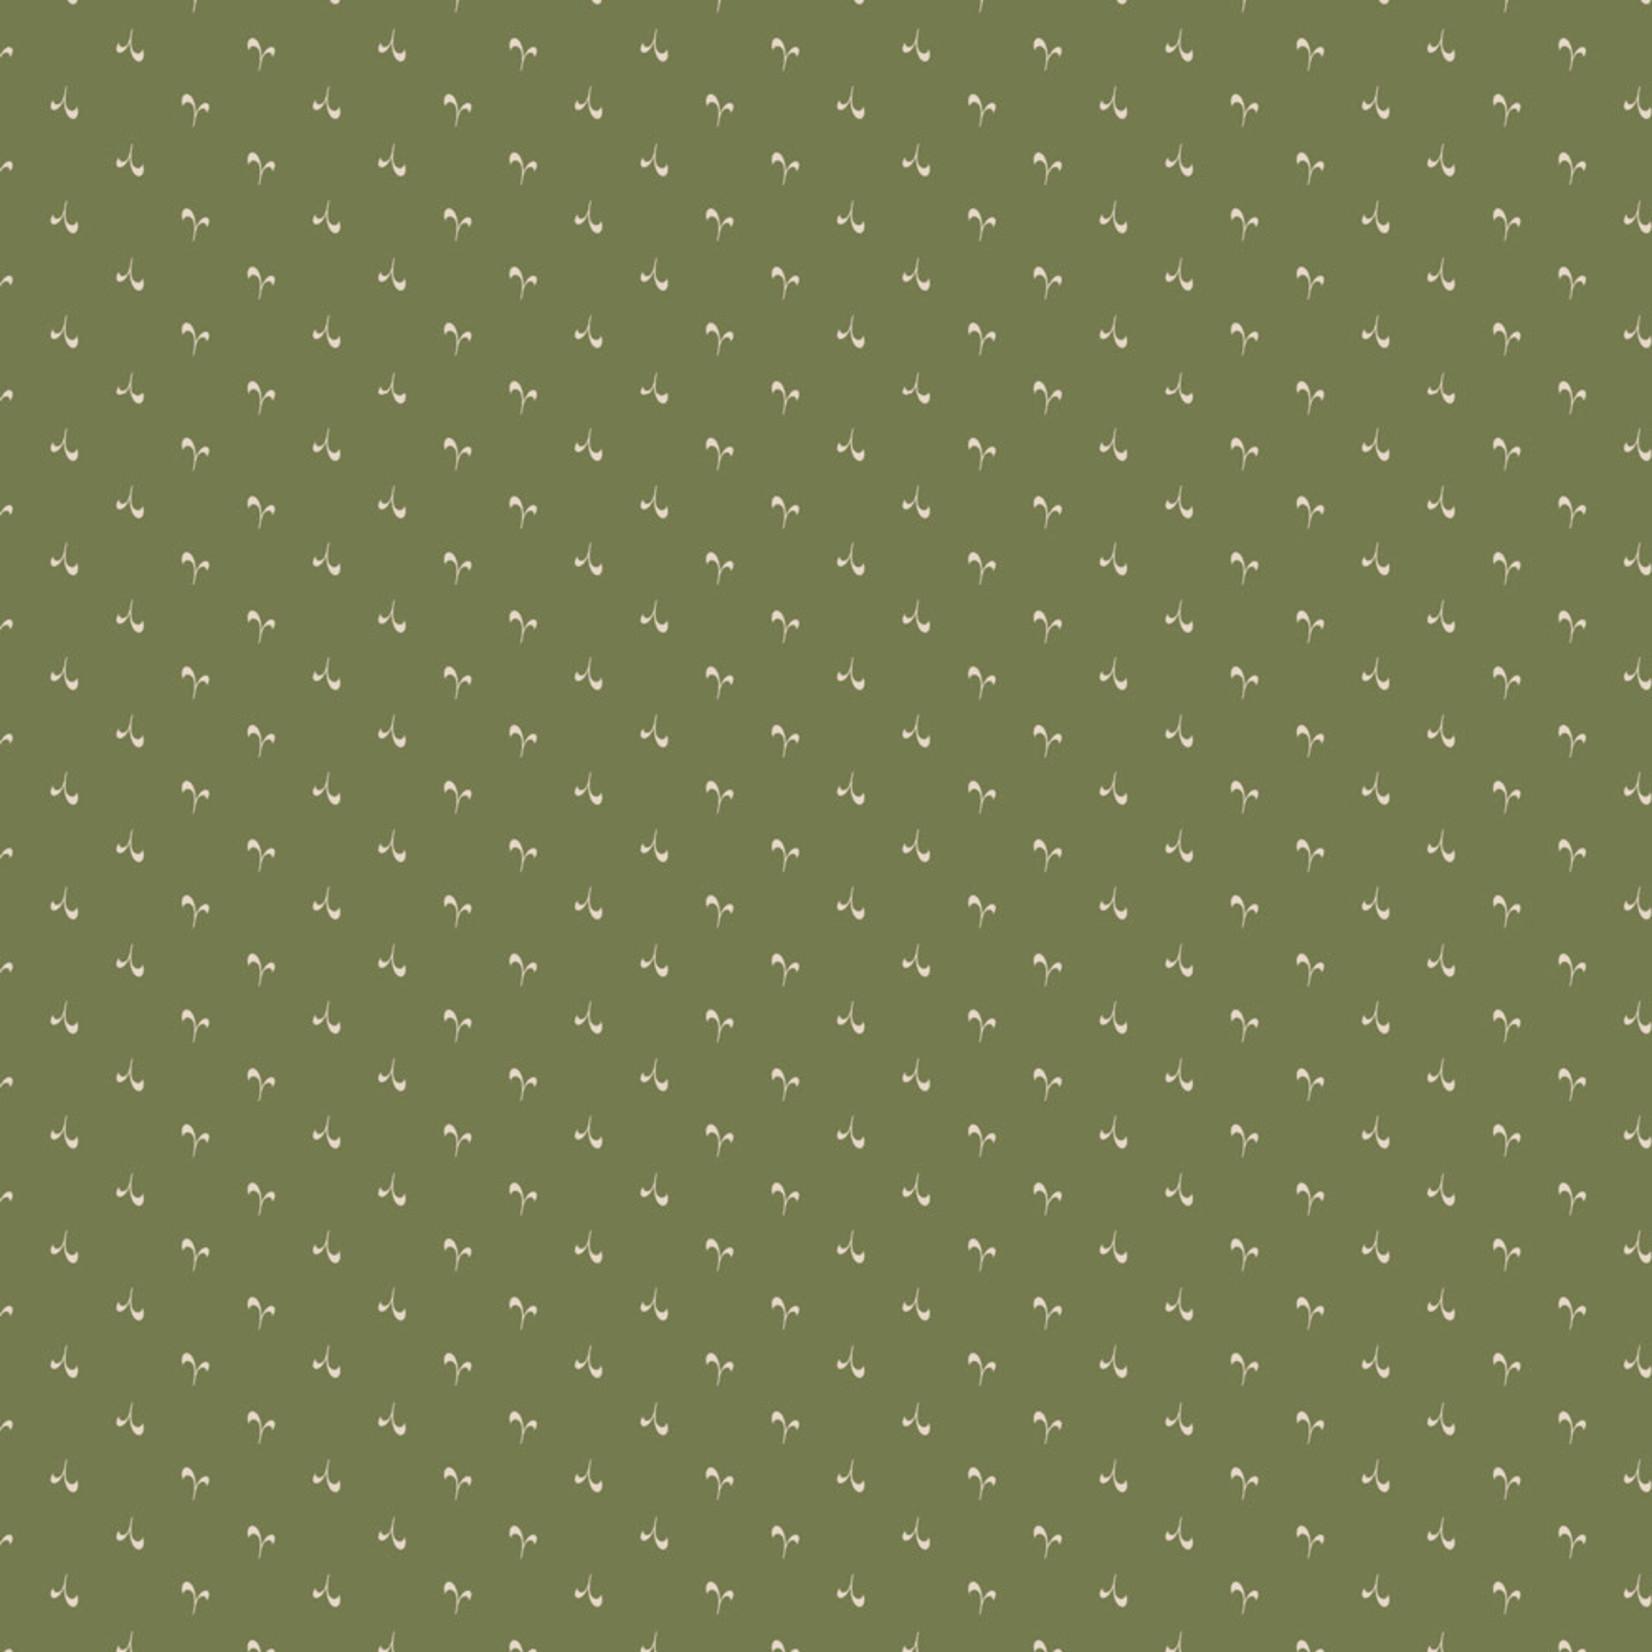 Stoffabrics Nellies Shirtlings - Check - Green